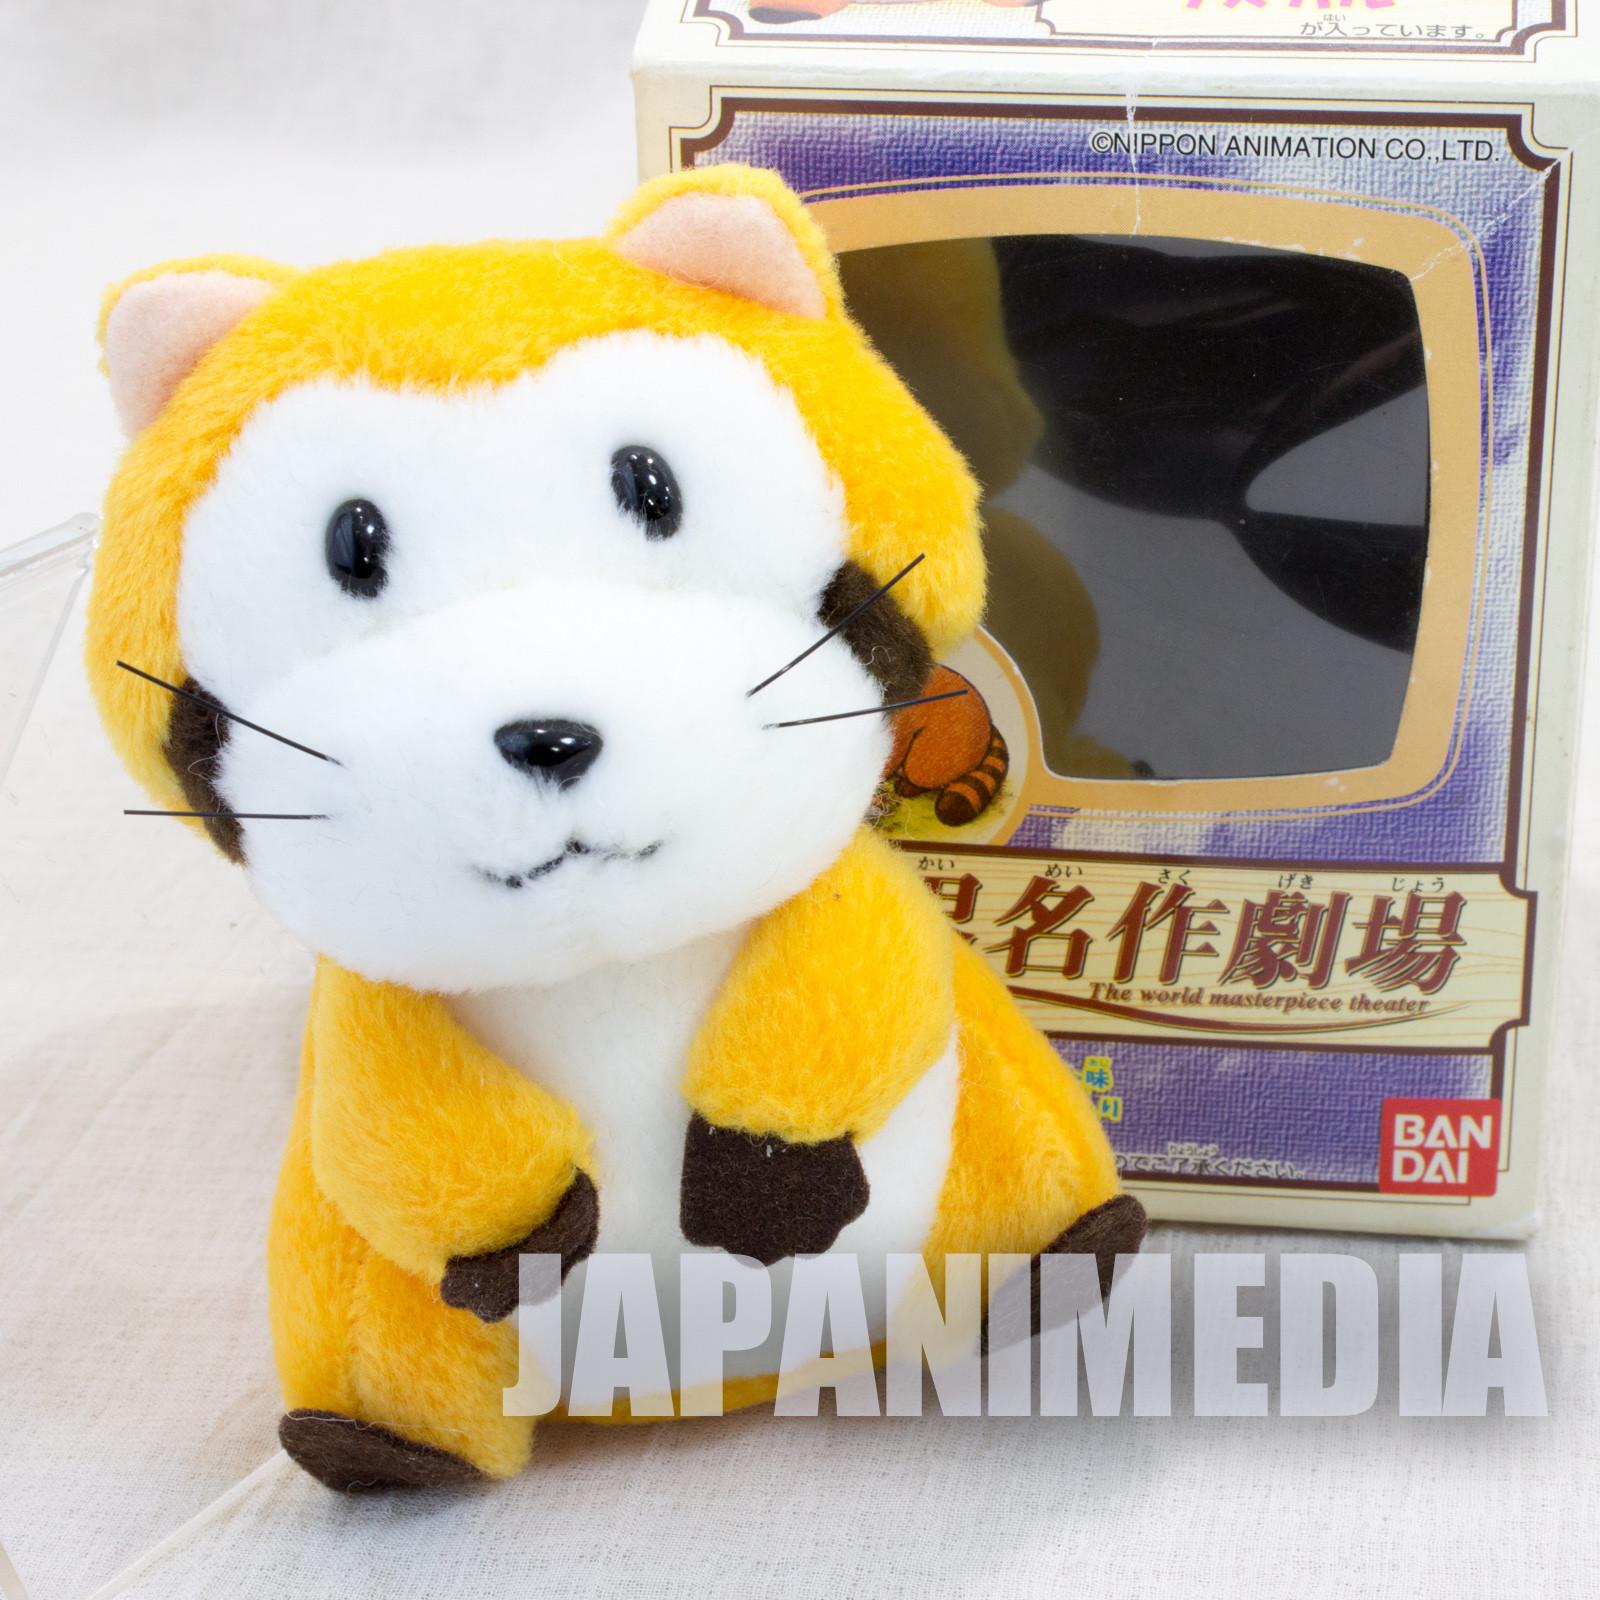 Rascal the Raccoon Mini Plush Doll Figure BANDAI JAPAN ANIME